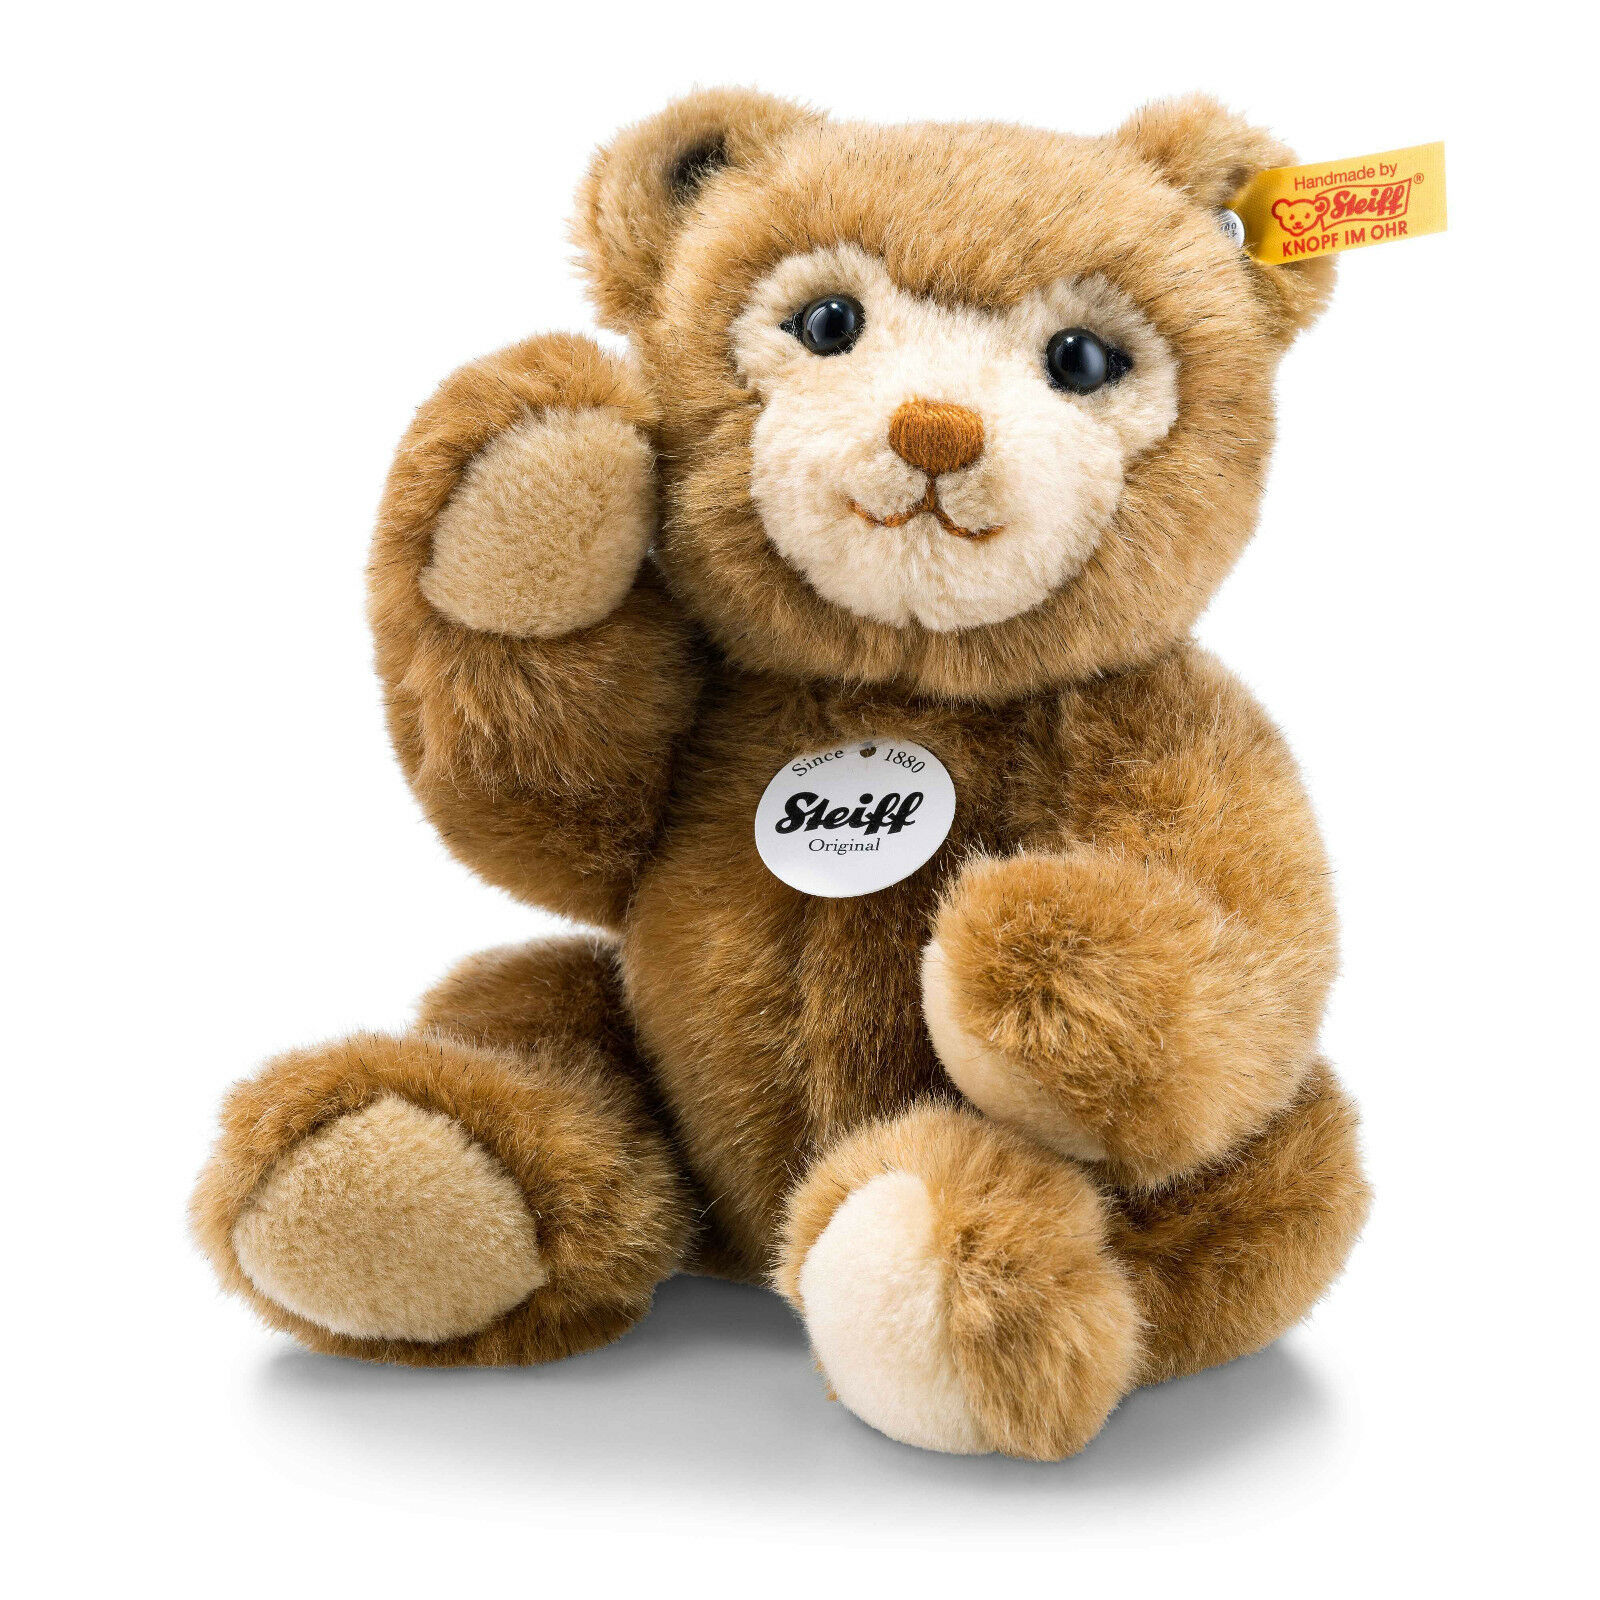 Steiff 023637 Chubble Teddybär 25 cm braun  incl Geschenkverpackung Geschenkverpackung Geschenkverpackung 81903f